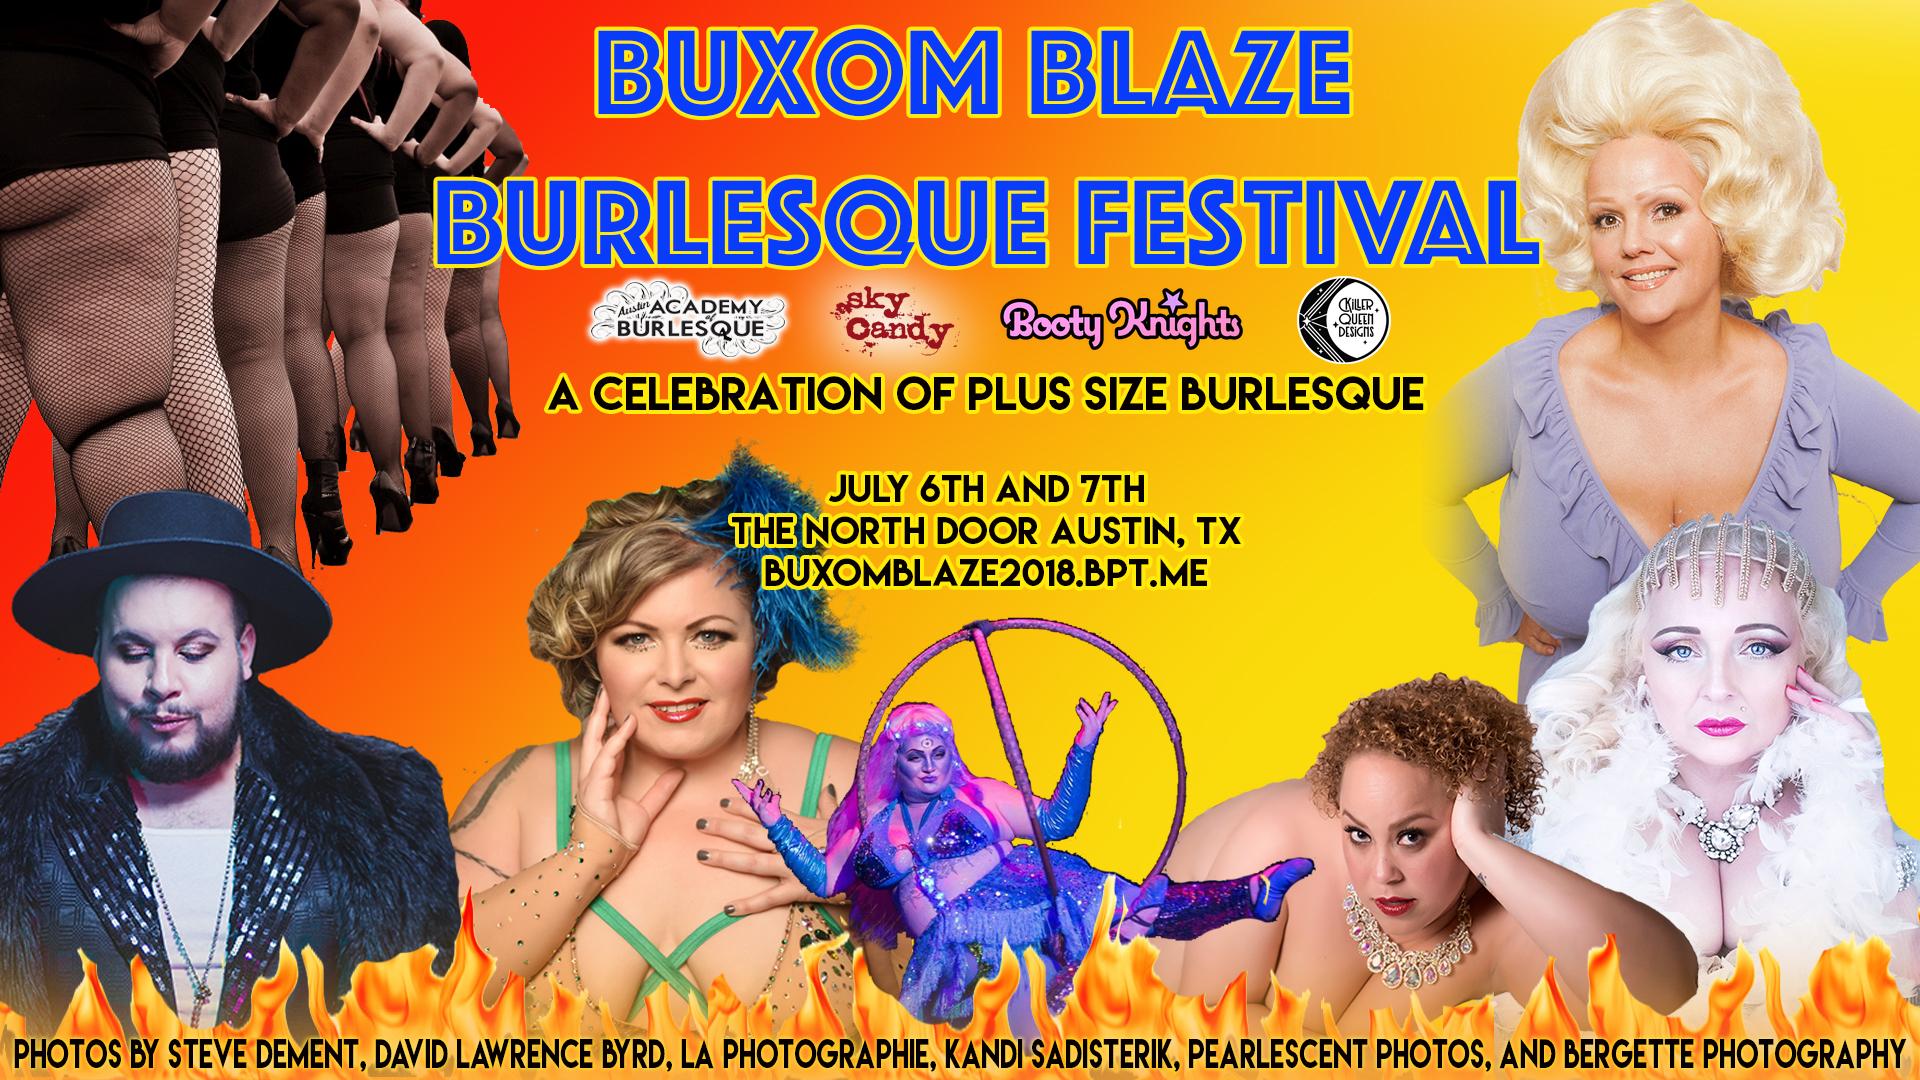 Buxome Blaze Burlesque Festival, Austin Burlesque, Burlesque Festival, Plus-sized burlesque